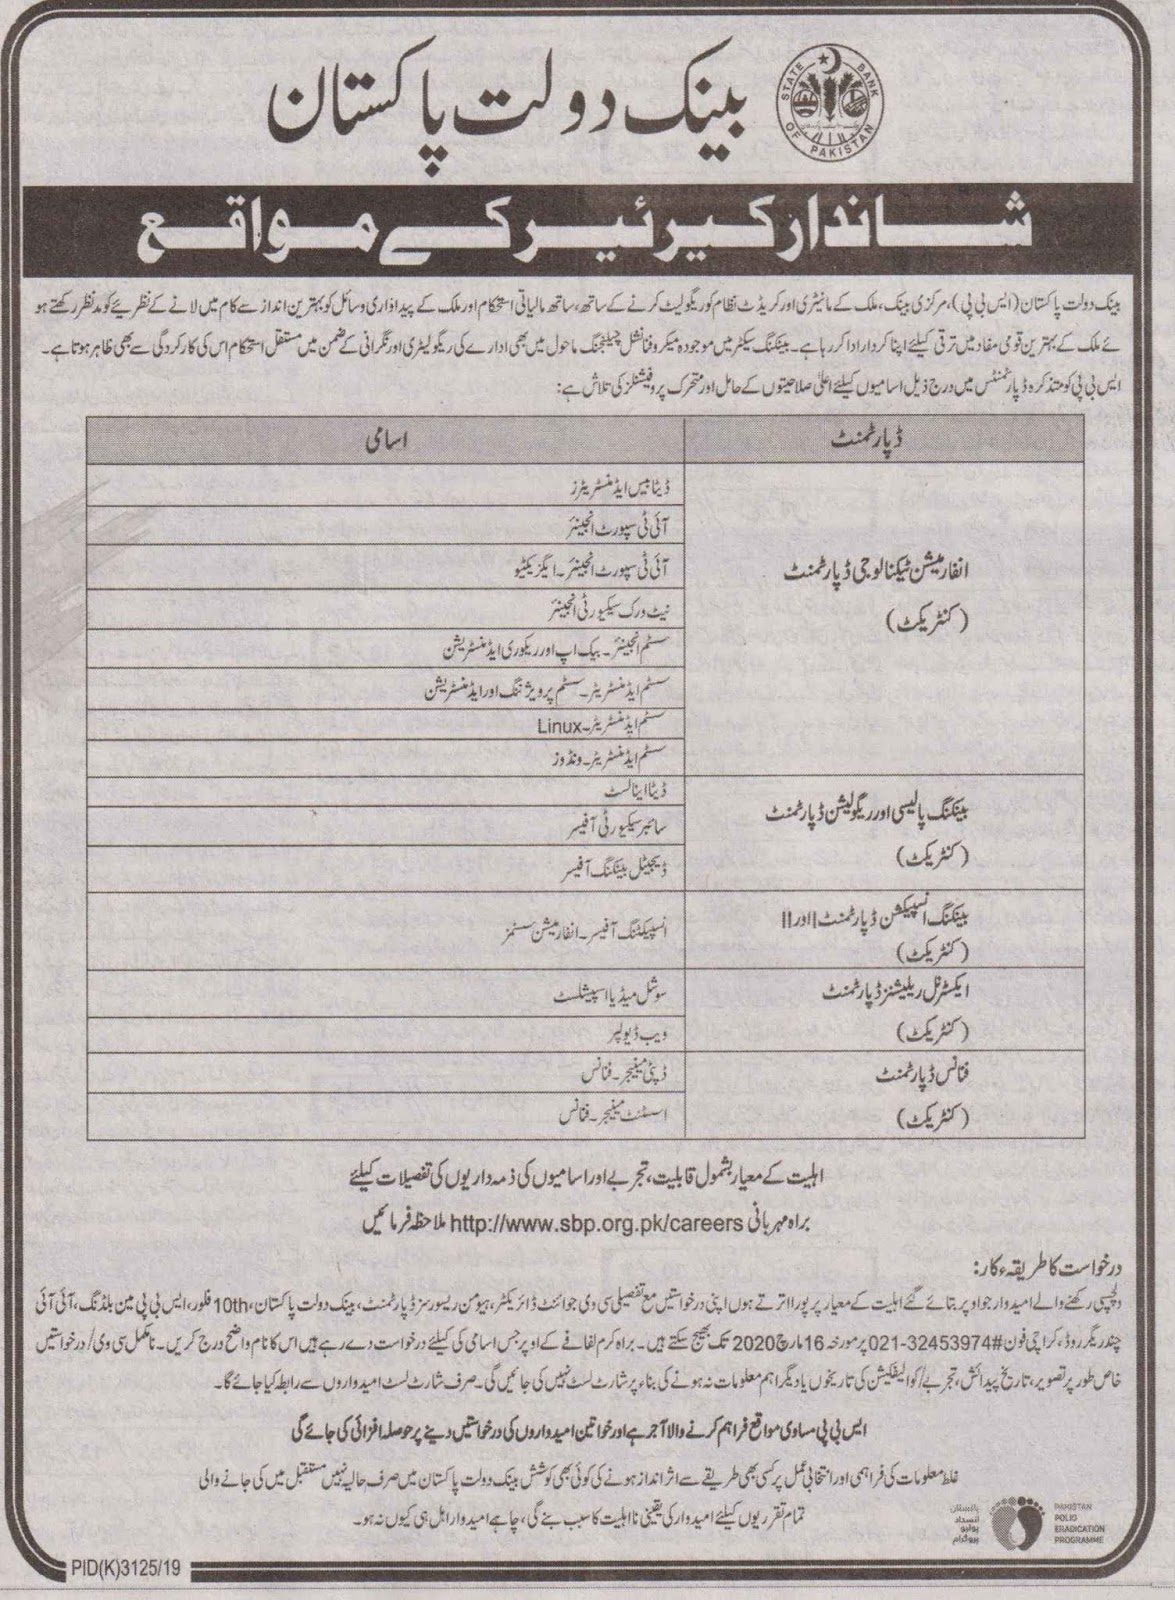 State Bank of Pakistan SBP Management Jobs 2020